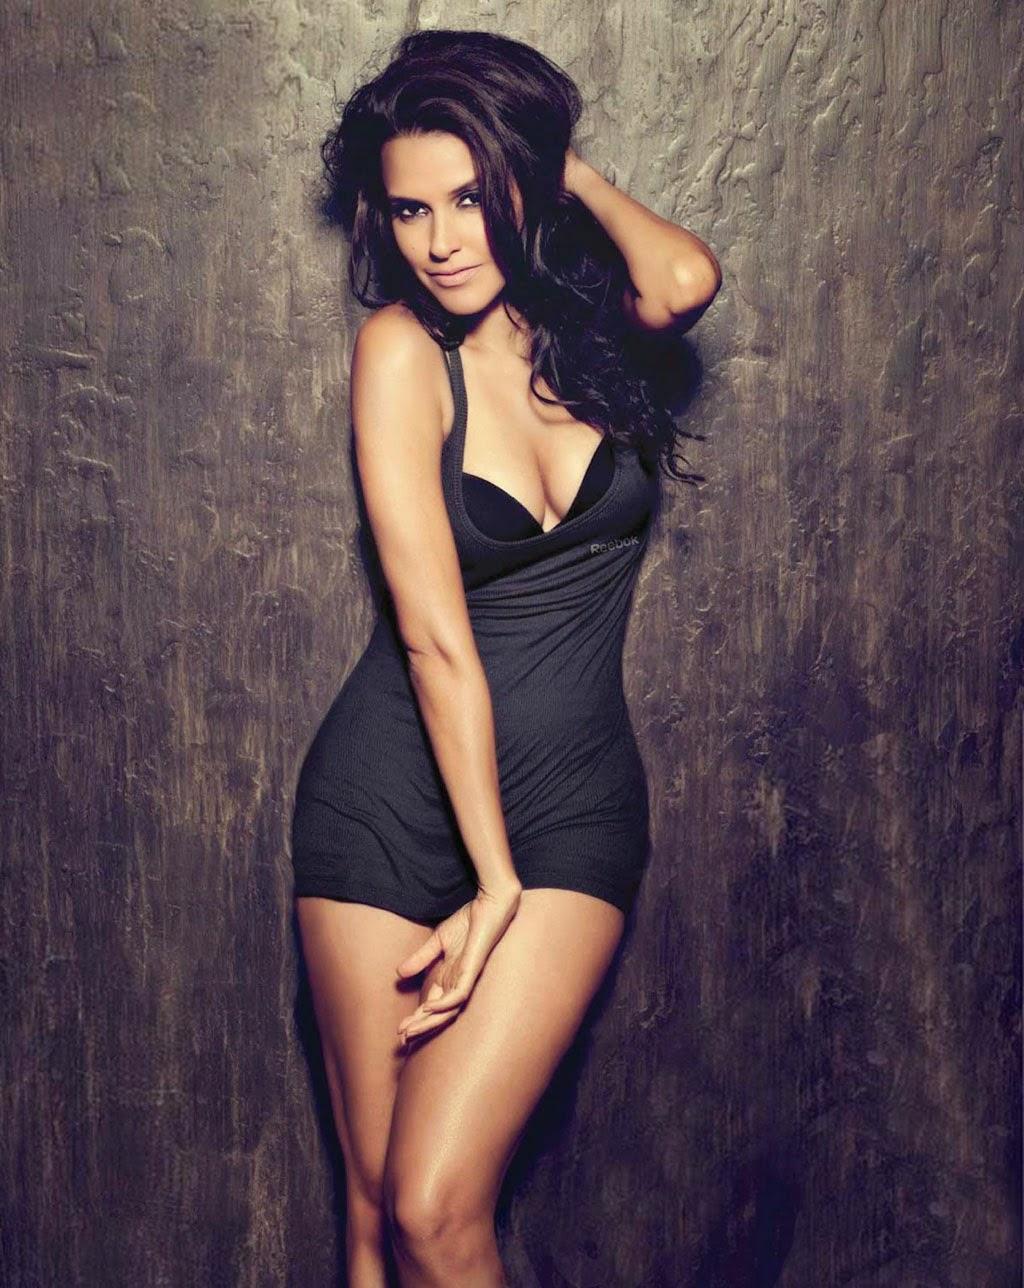 Neha Dhupia Hot & Wild in Maxim Magazine